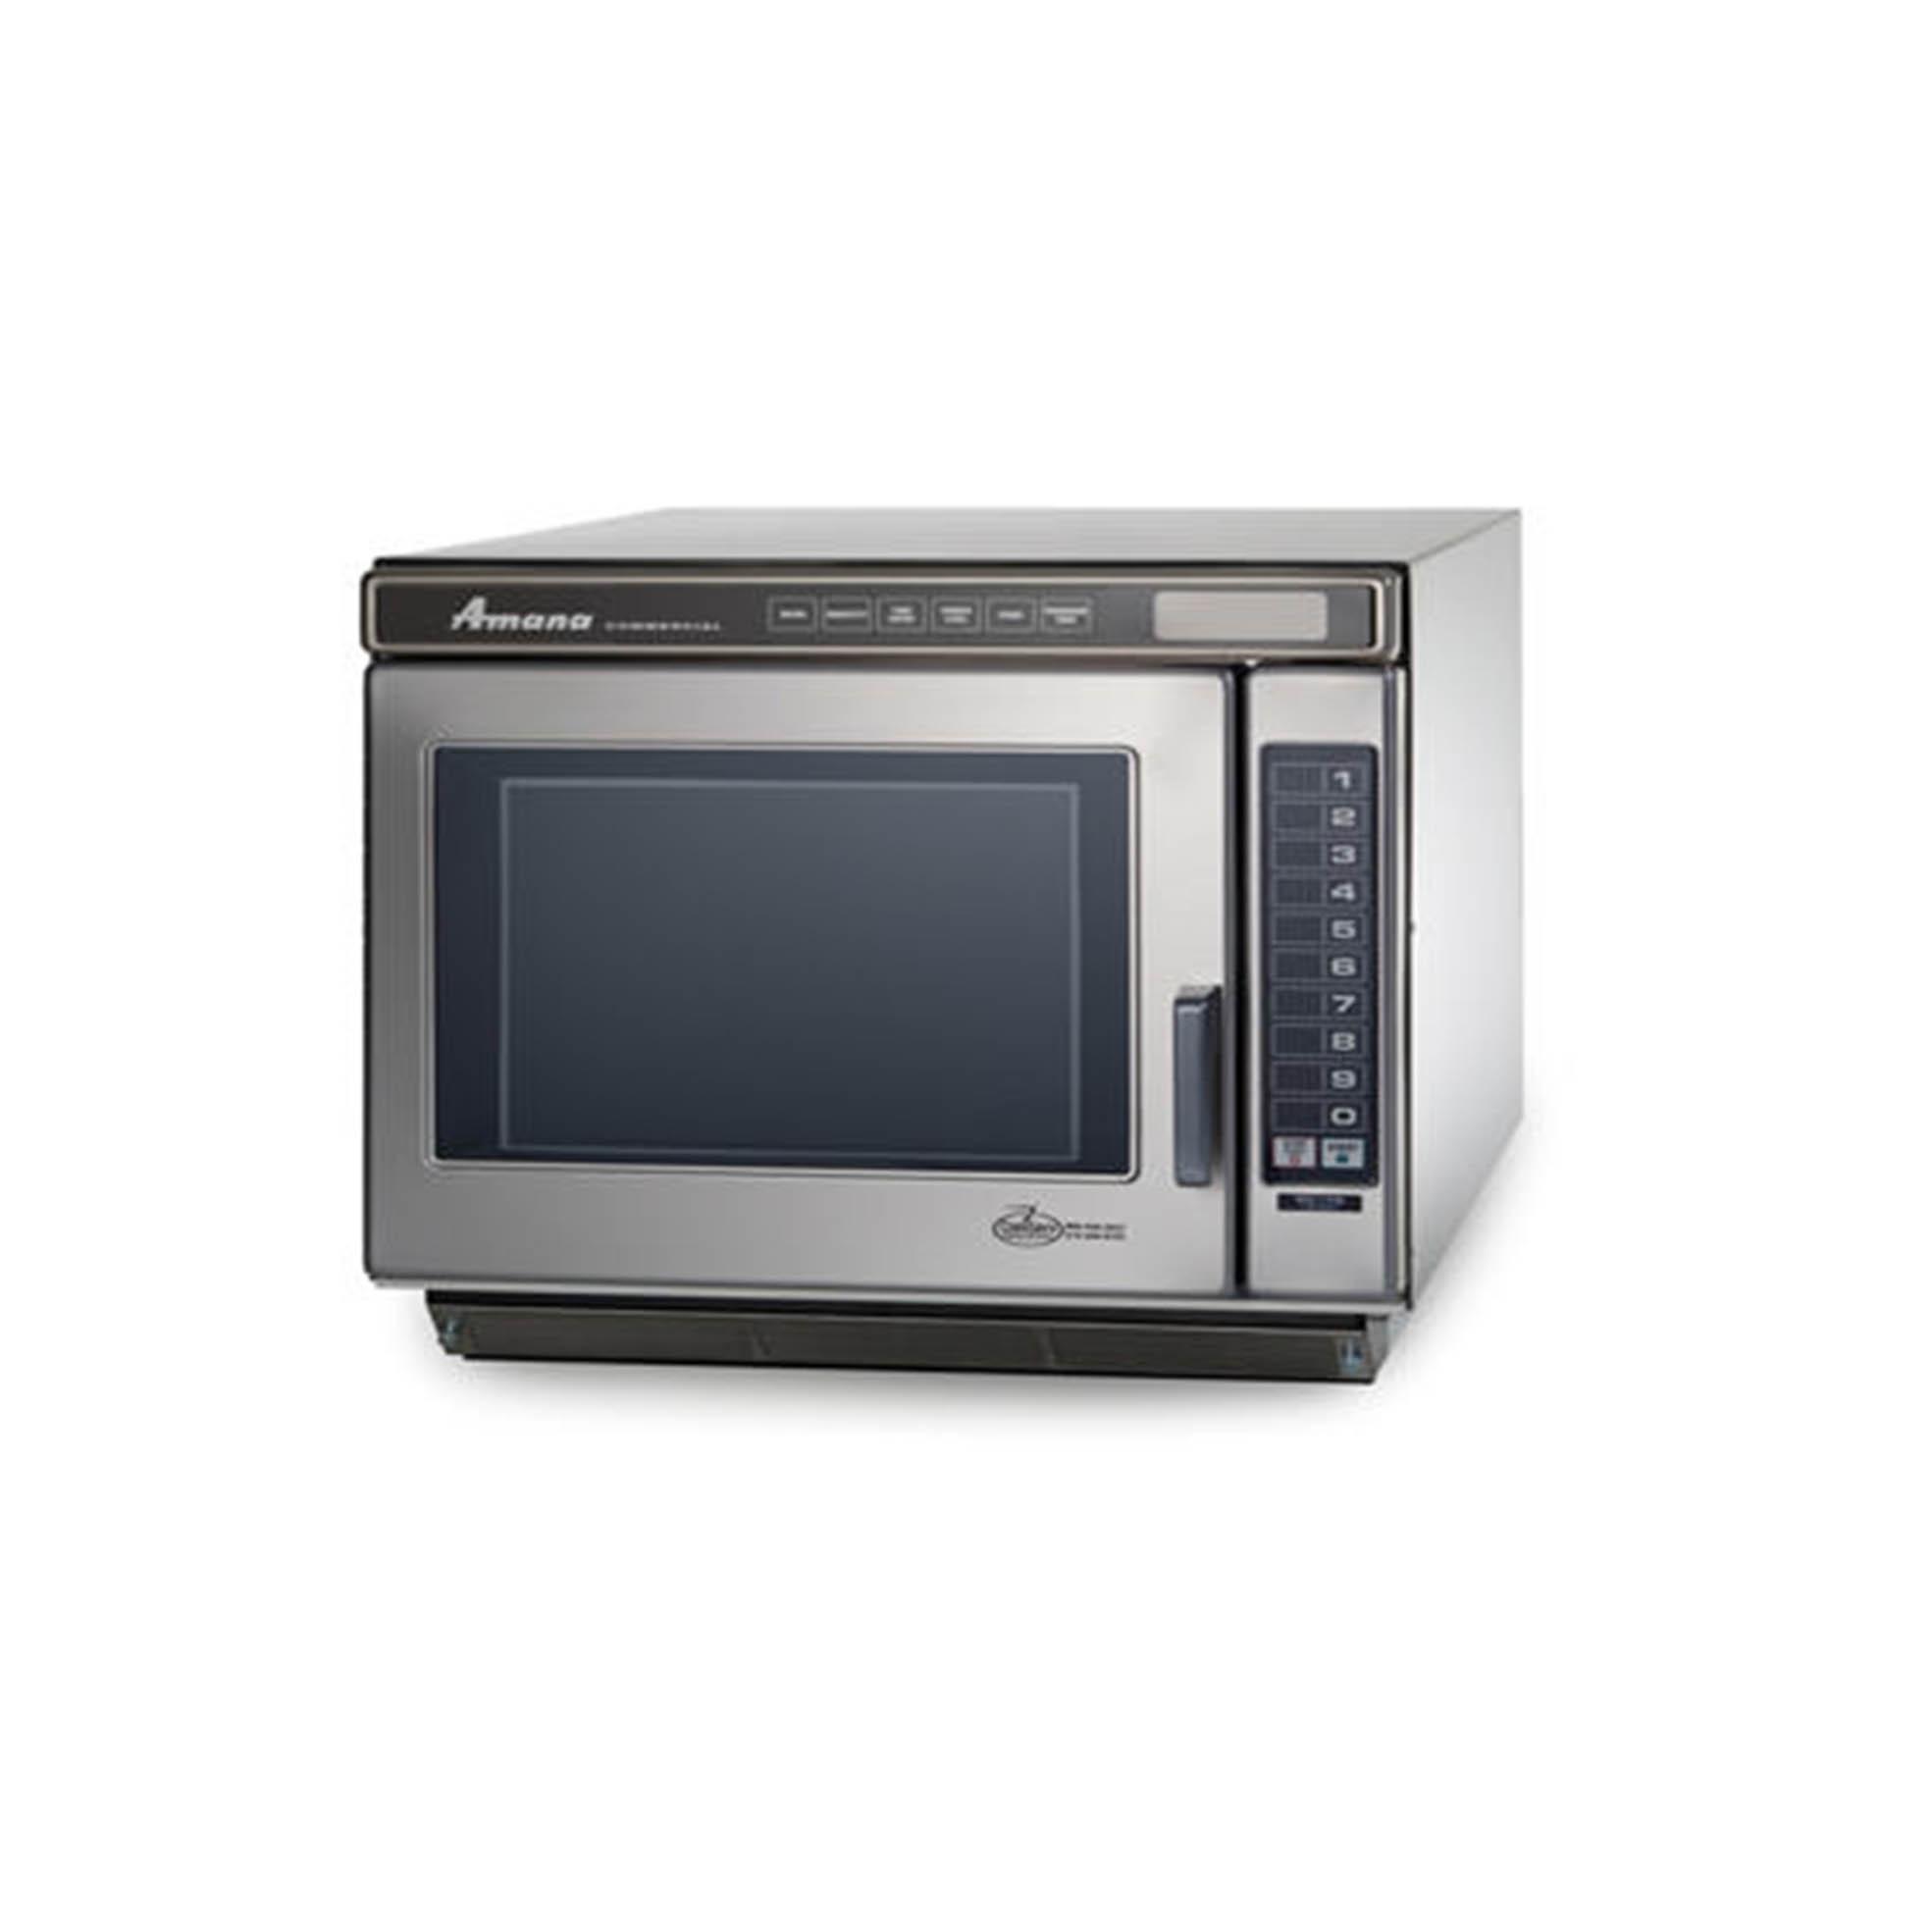 amana rc30s2 3000 watts digital control